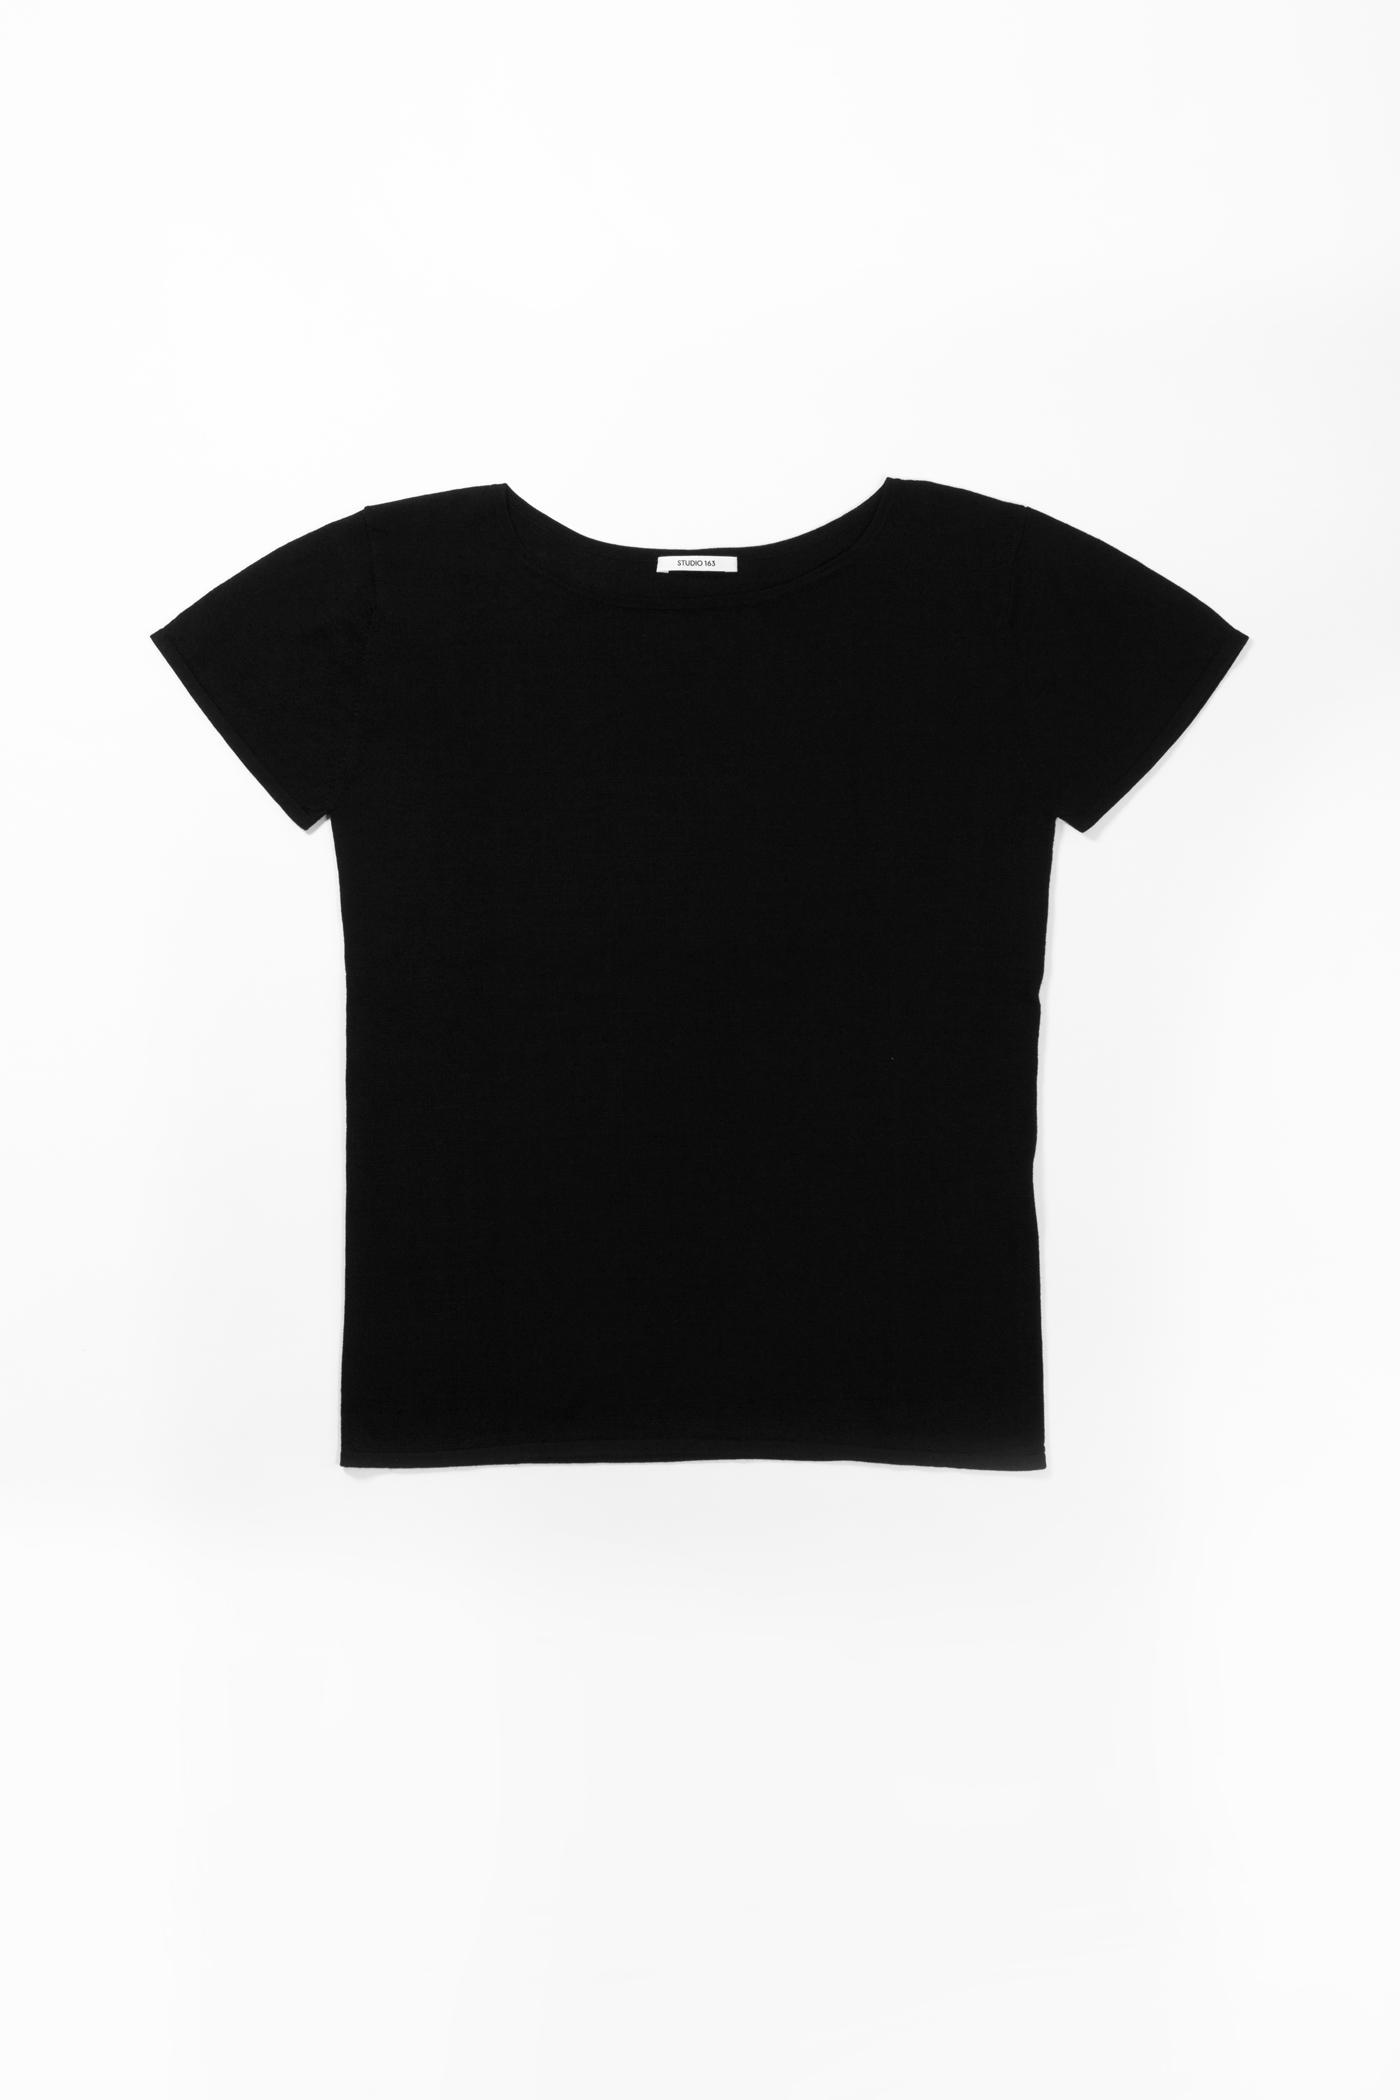 eaeace1c STUDIO 163 Silk blend shirt — STUDIO 163